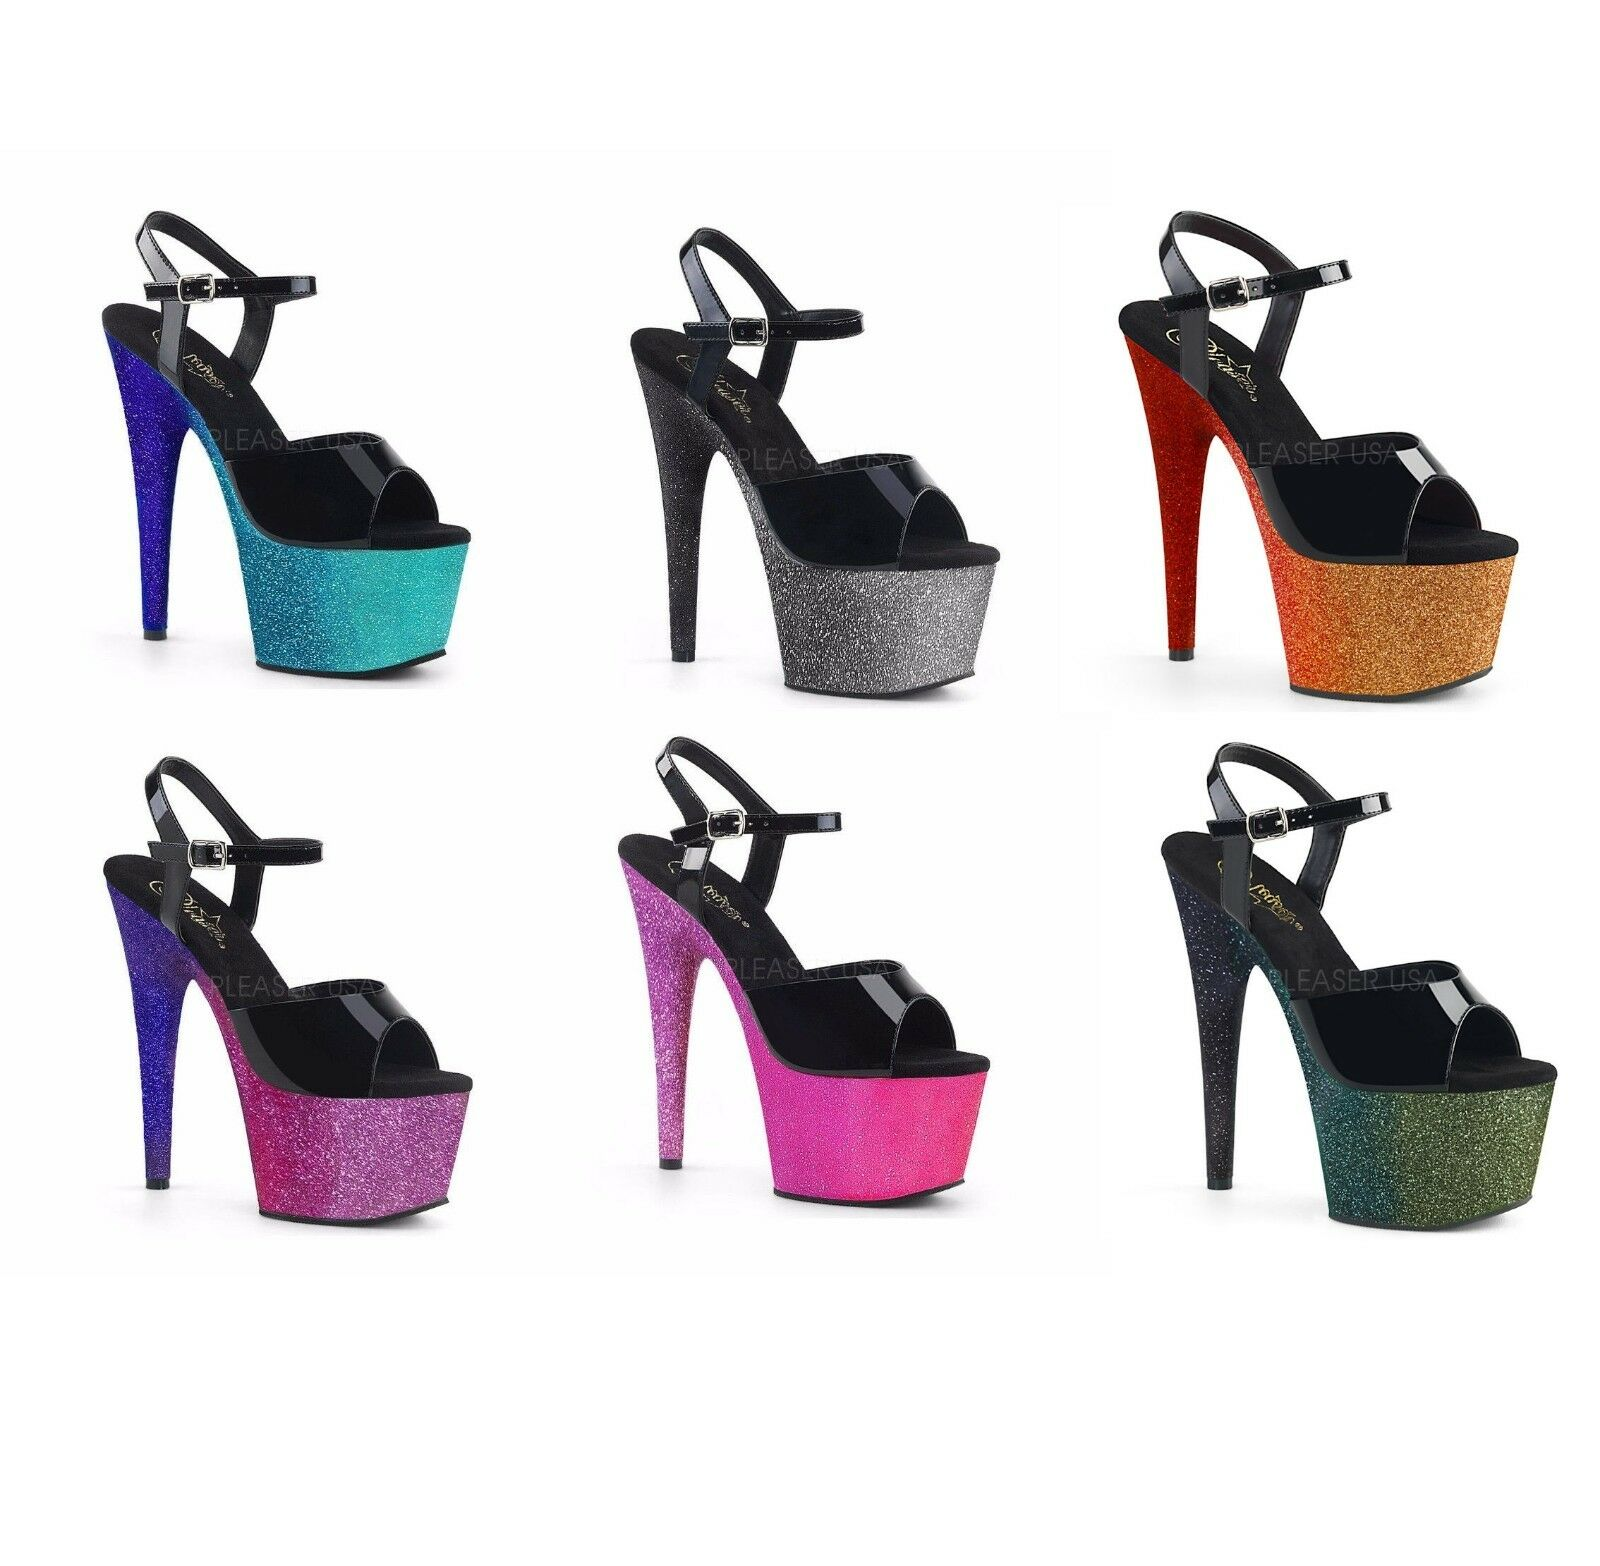 Pleaser ADORE-709OMBRE Exotic Sandale Dancing Platform Ankle Strap Sandale Exotic Glitters 7